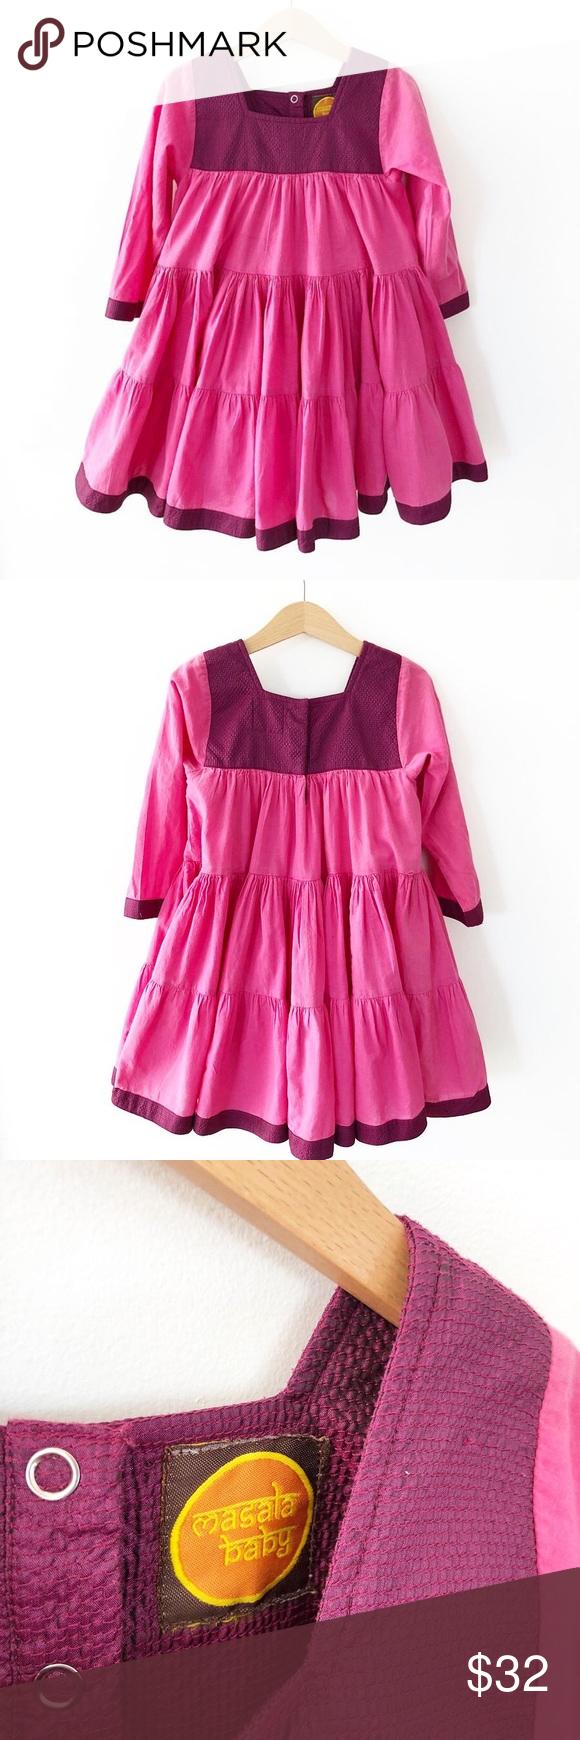 100 Cotton Masala Baby Twirl Pink Party Dress 4t Pink Party Dresses Party Dress 4t Dress [ 1740 x 580 Pixel ]